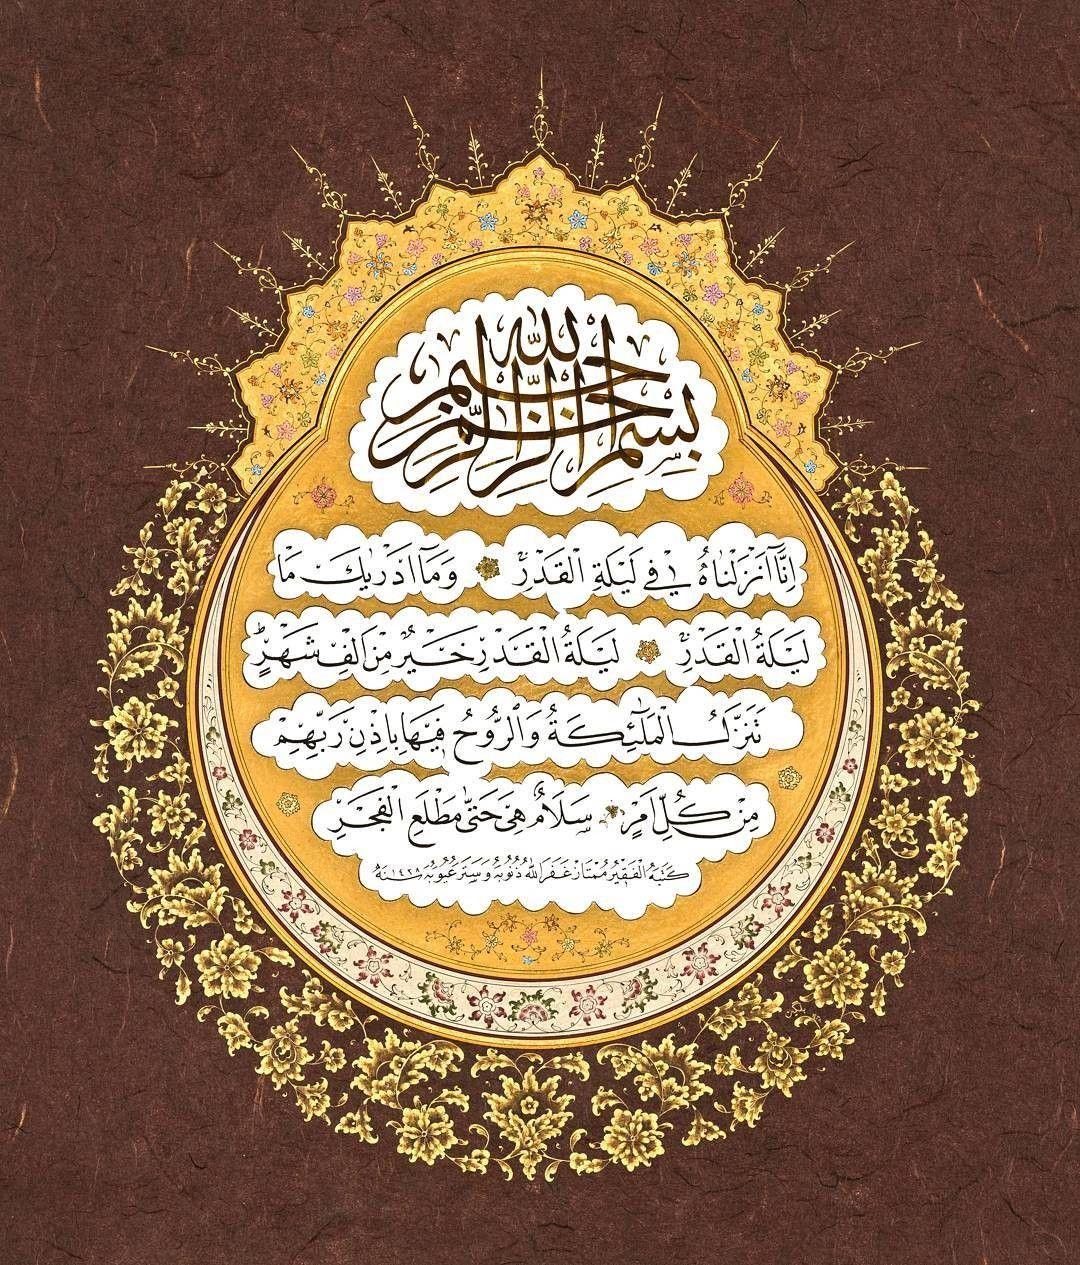 Pin By Mohieddinekhatt On Caligraphie Islamic Art Calligraphy Learn Calligraphy Arabic Calligraphy Art